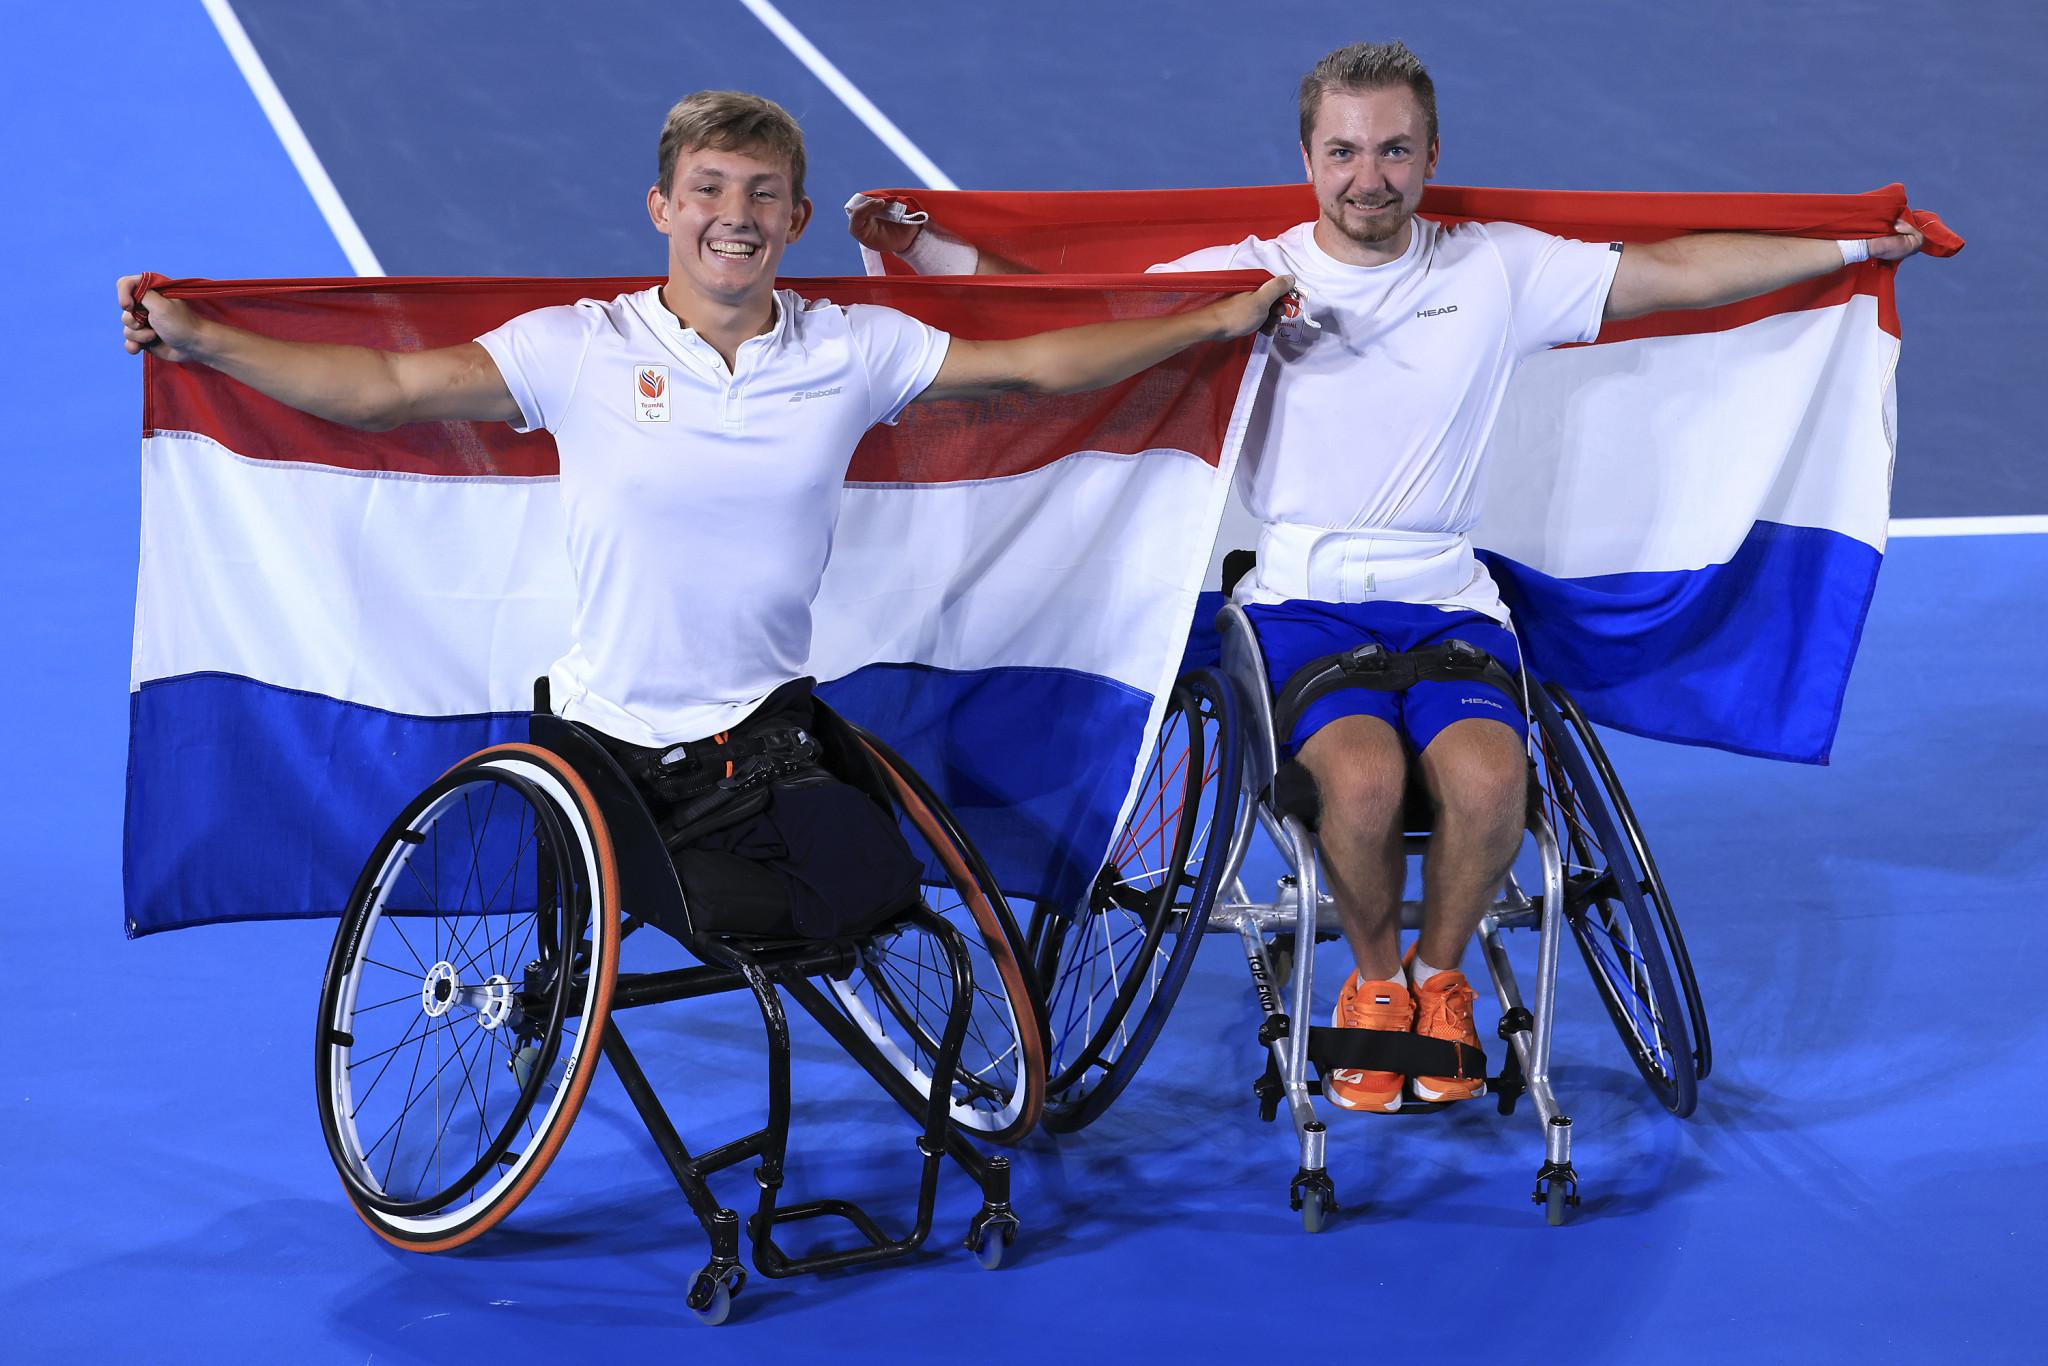 Schröder and Vink stun defending champions Alcott and Davidson in wheelchair tennis quad doubles final